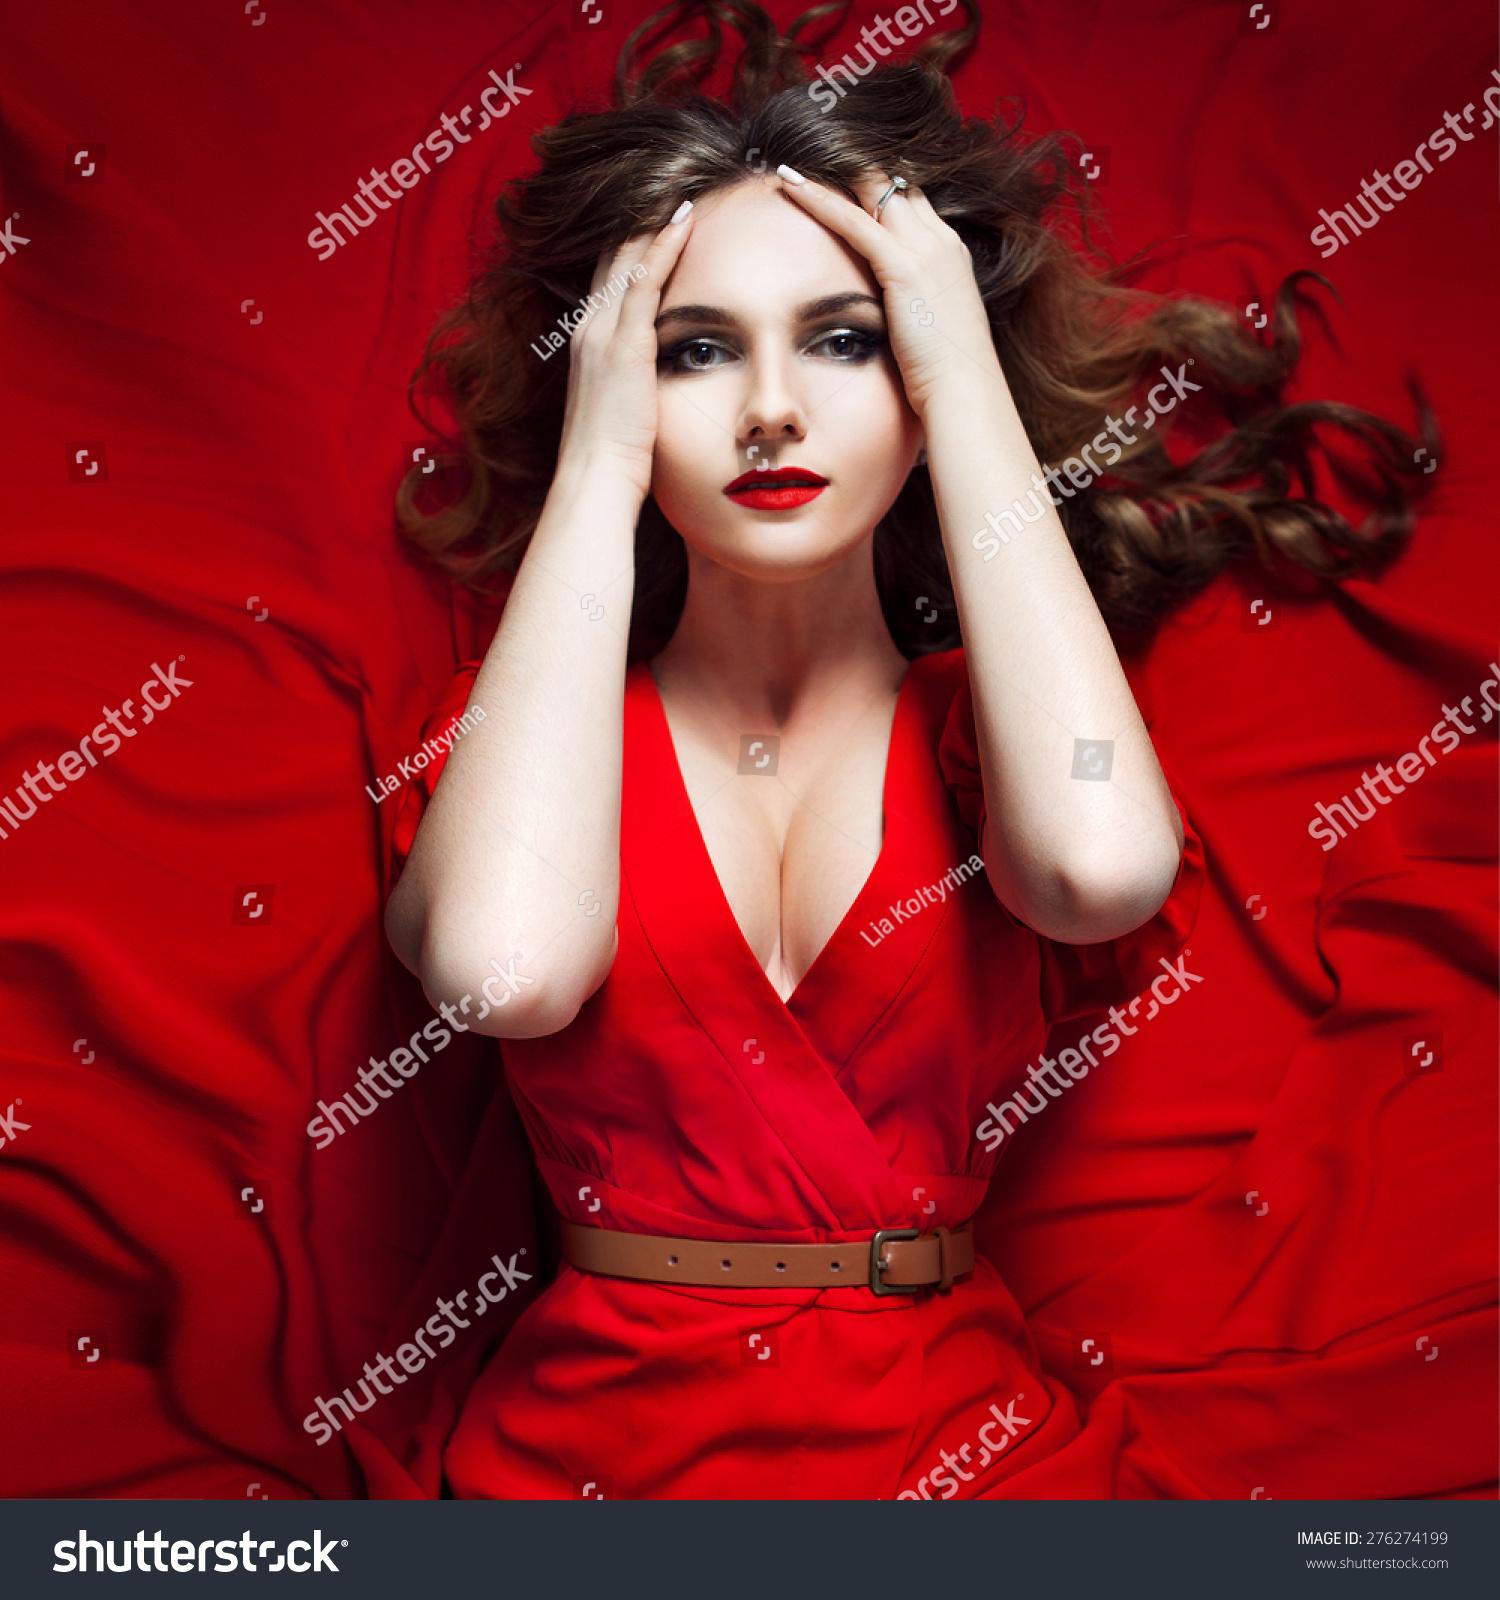 Woman Red Dress Posing Waving Fabric Stock Photo 276274199 ...